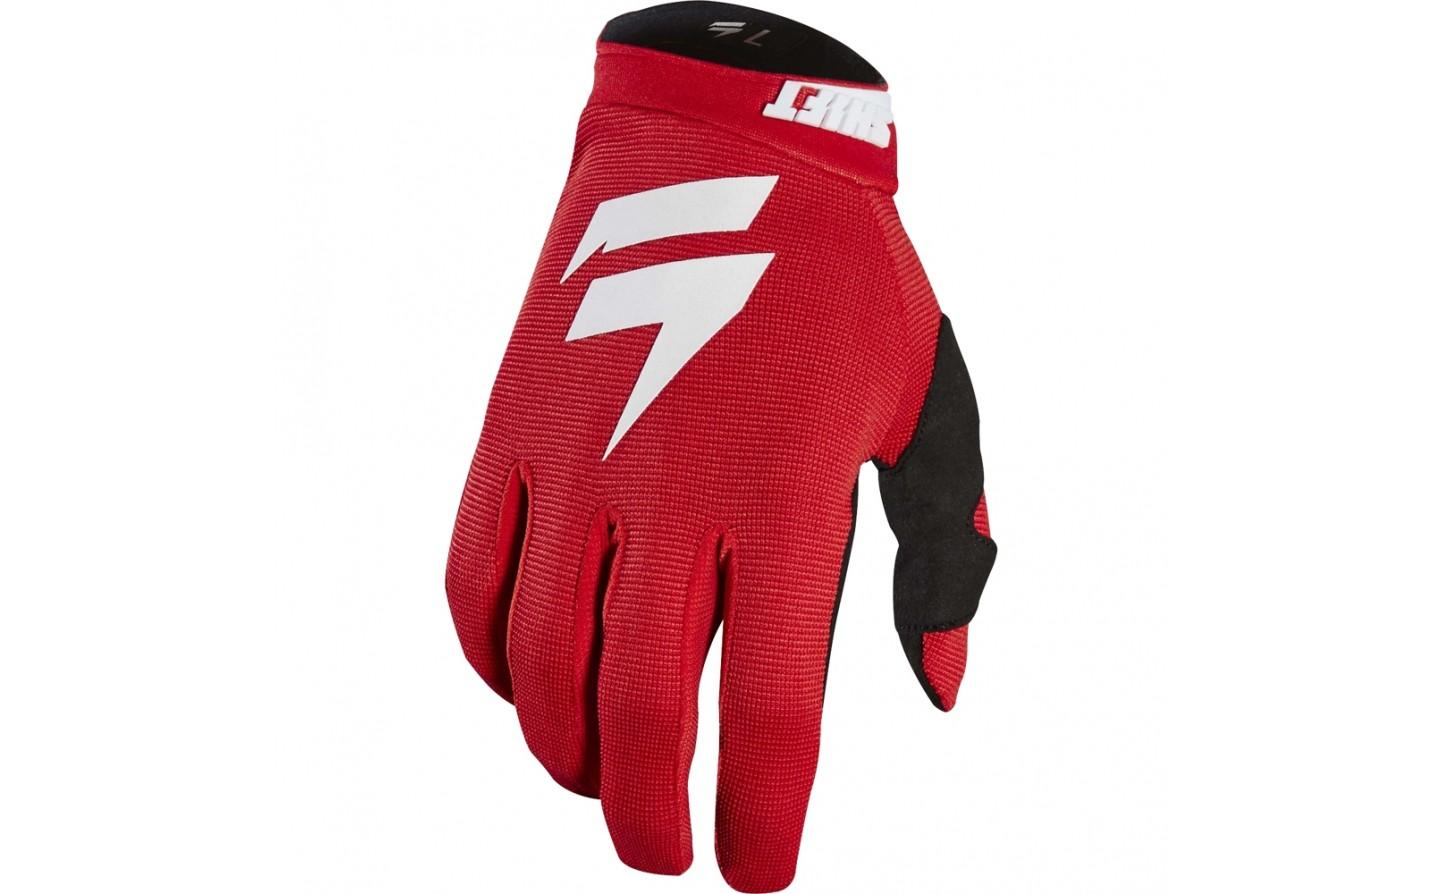 guante shift whit3 air glove  rojo/blanco talle xl